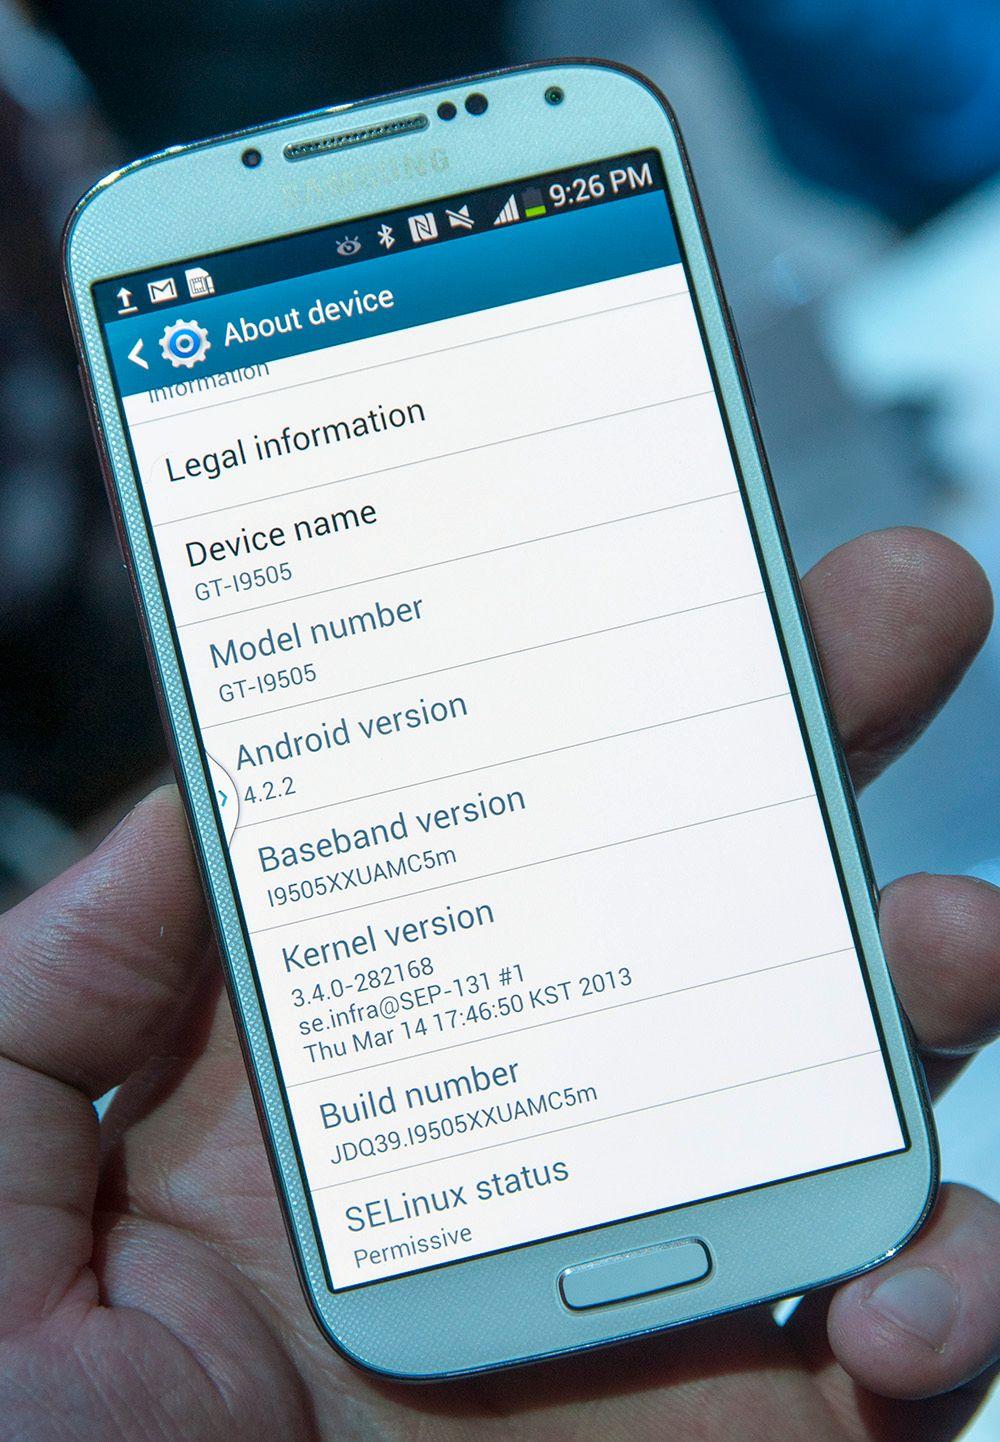 Flaggskipet leveres med Android 4.2.2 Jelly Bean.Foto: Finn Jarle Kvalheim, Amobil.no